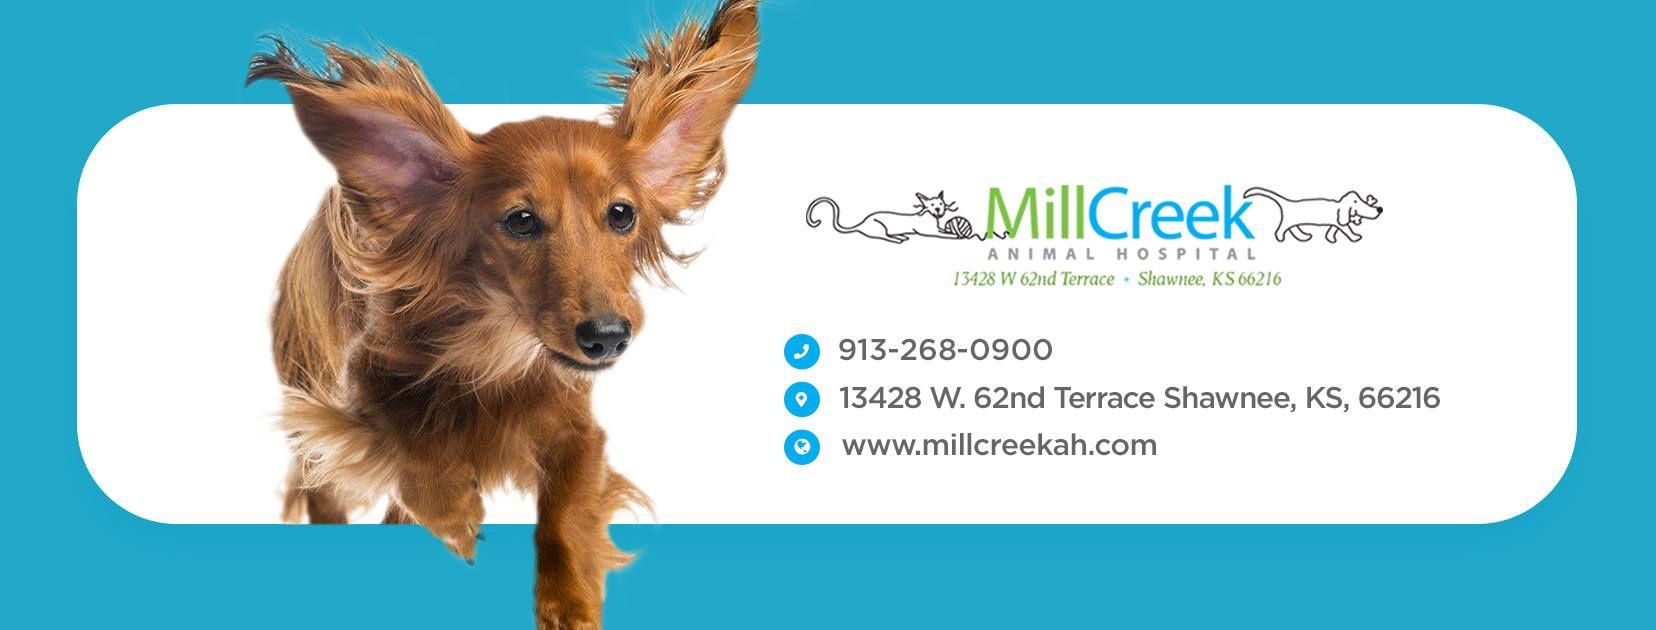 Mill Creek Animal Hospital, Vet in Shawnee KS